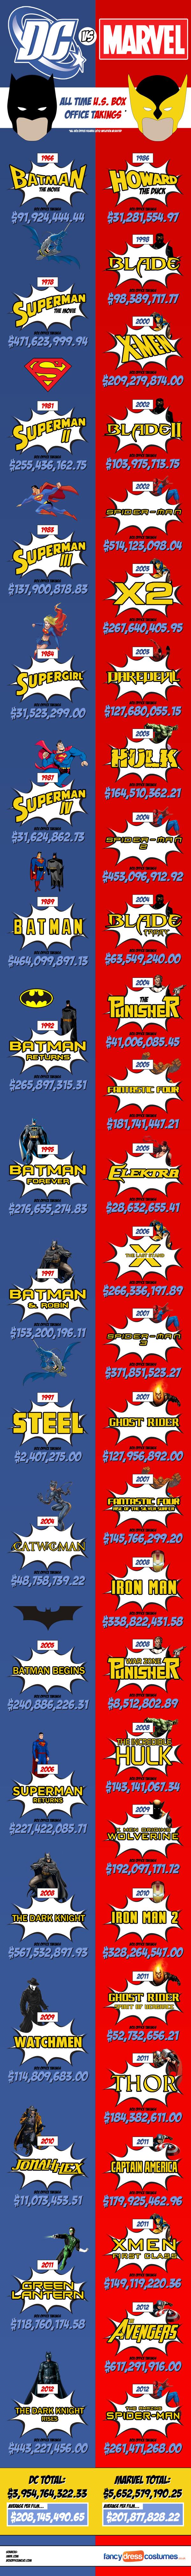 Infografia Peliculas - Marvel Vs DC